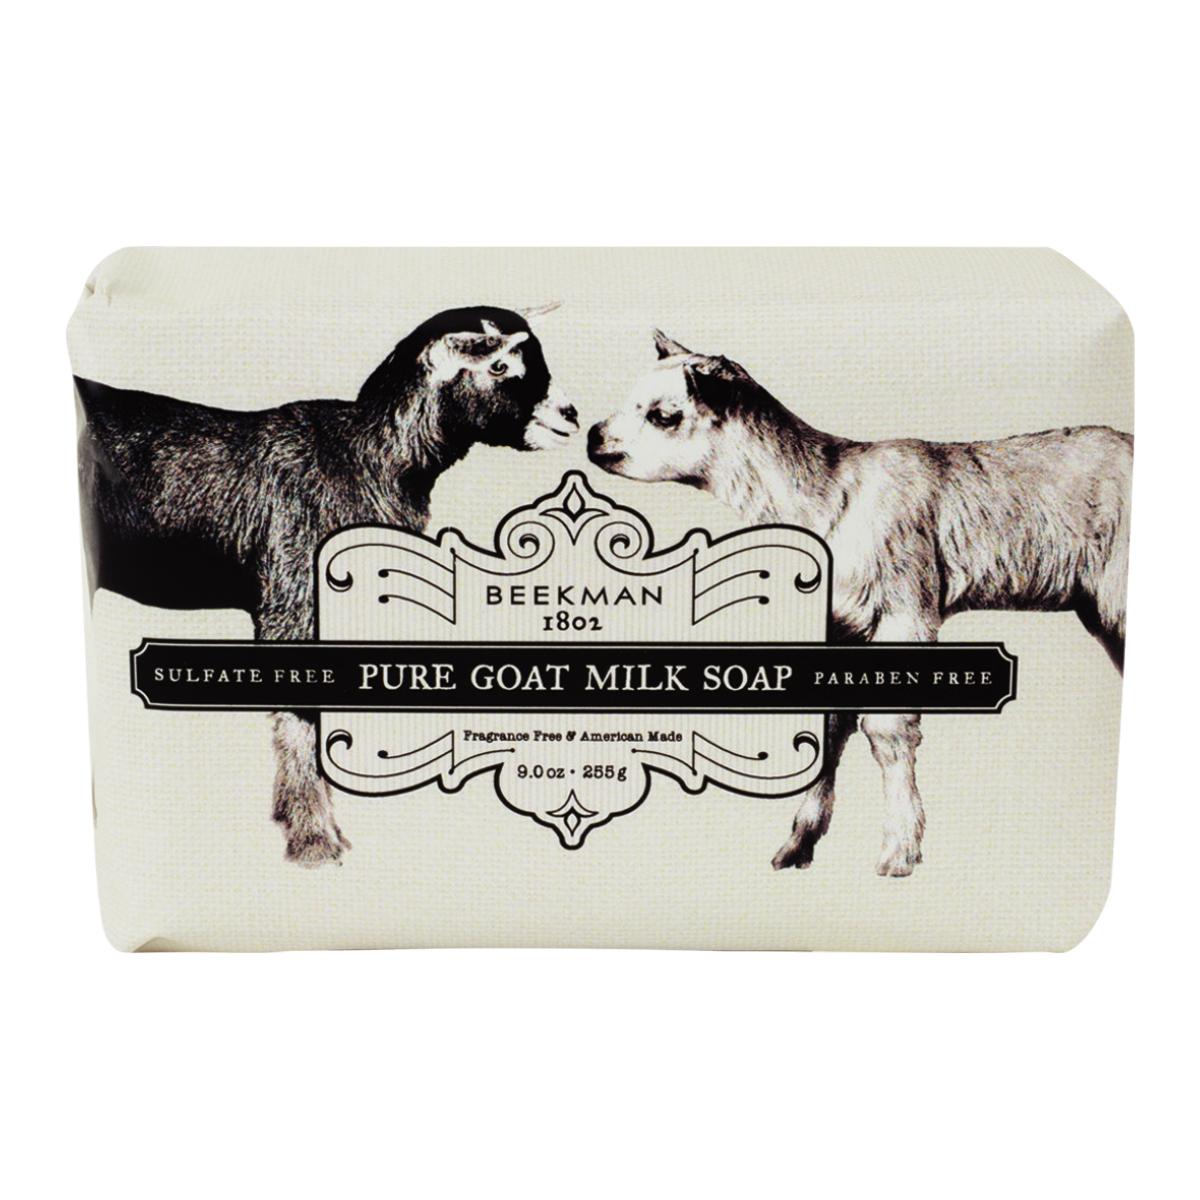 Beekman Pure Goat Milk Soap